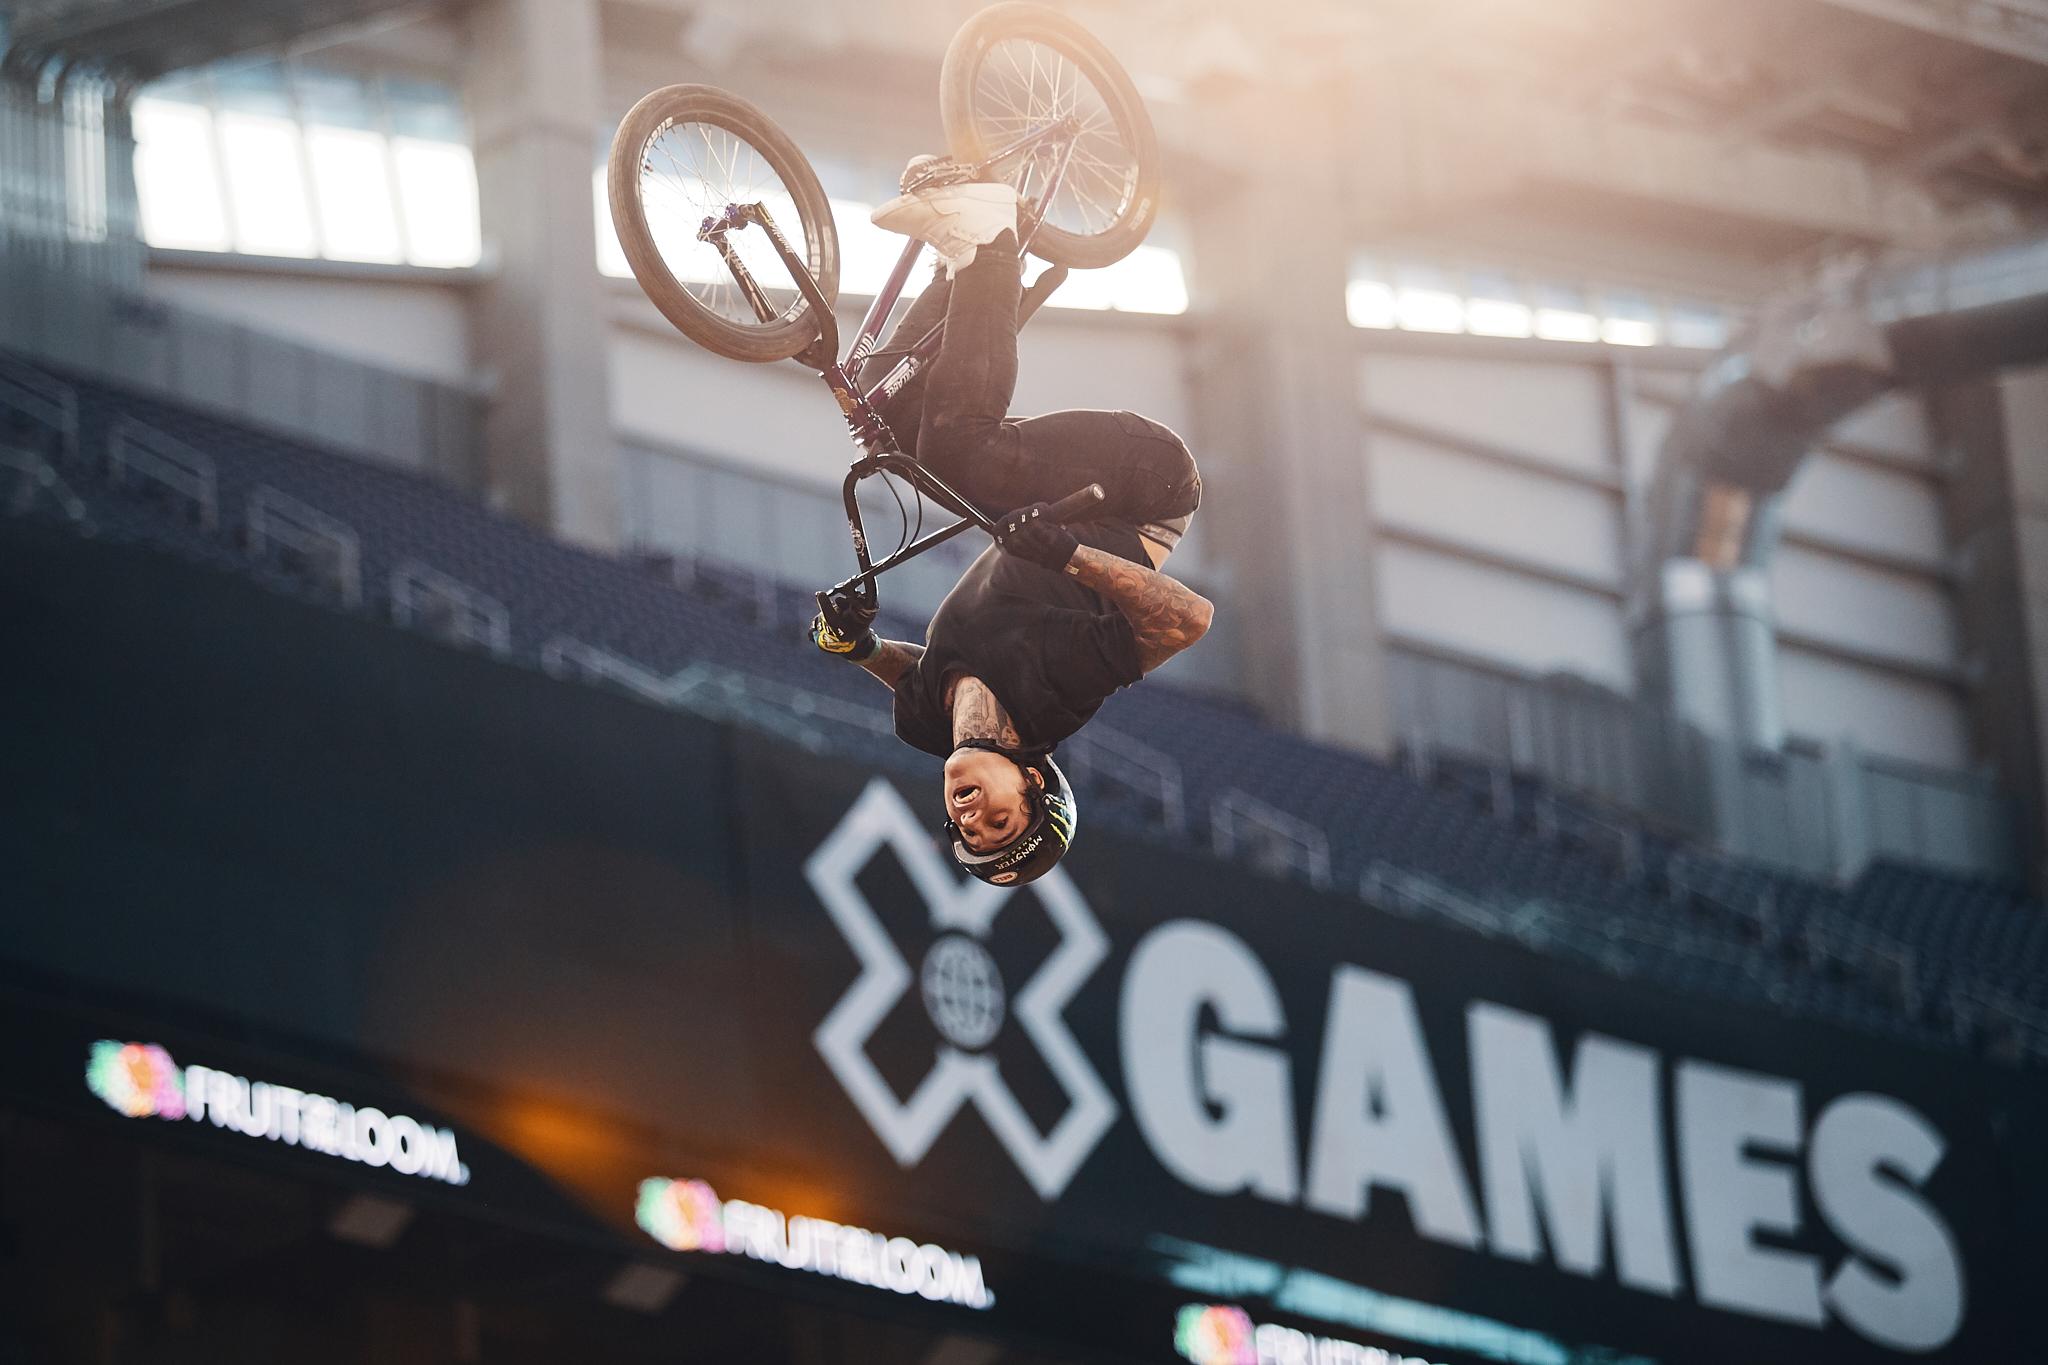 X_Games_2018_at_US-Bank_Stadium_Photo_By_Joe_Lemke_047.jpg